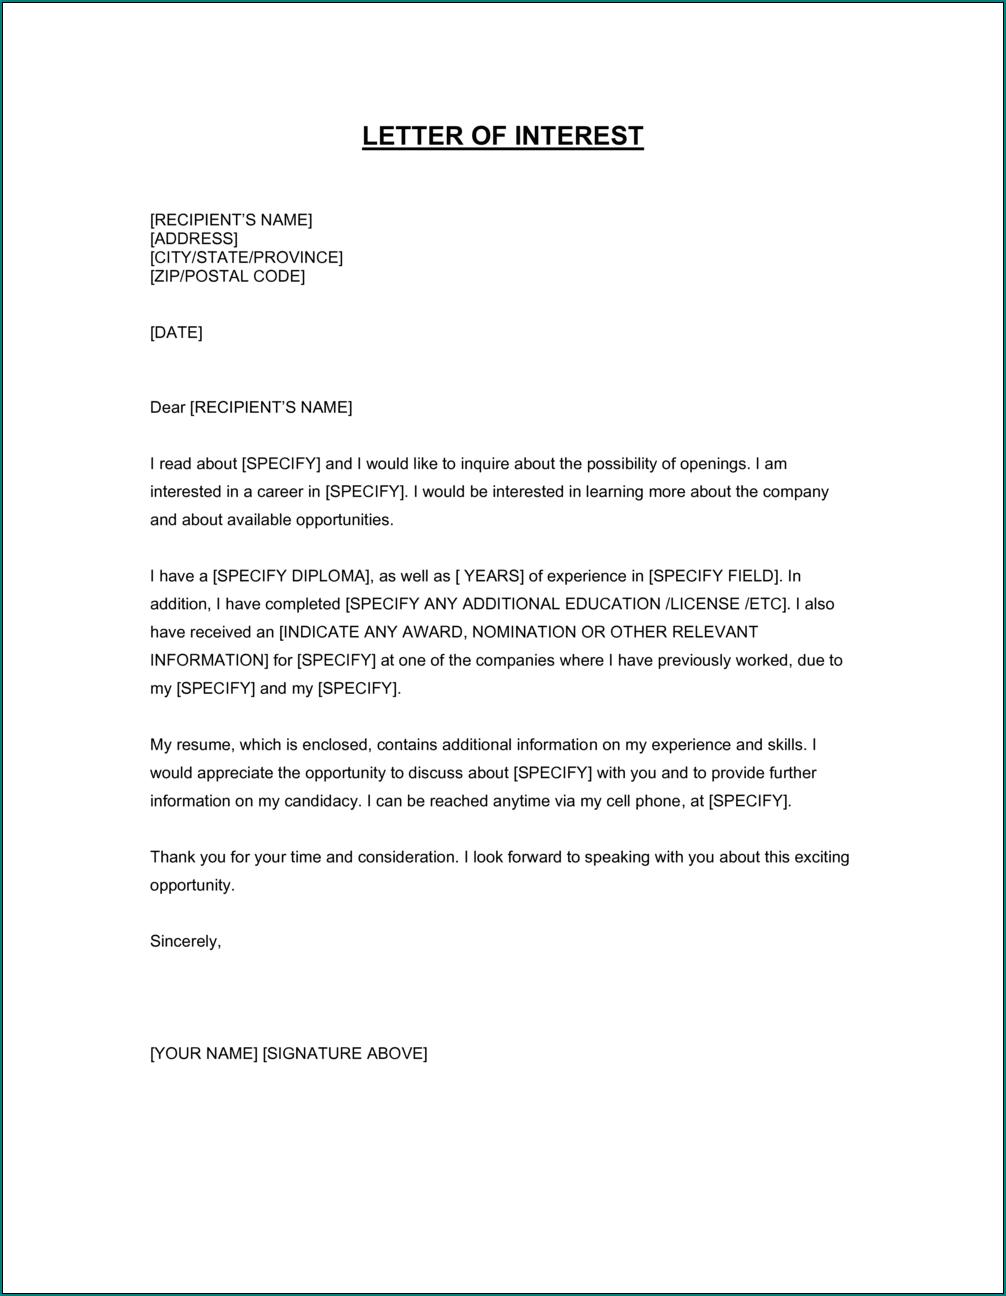 Sample of Letter Of Interest Template